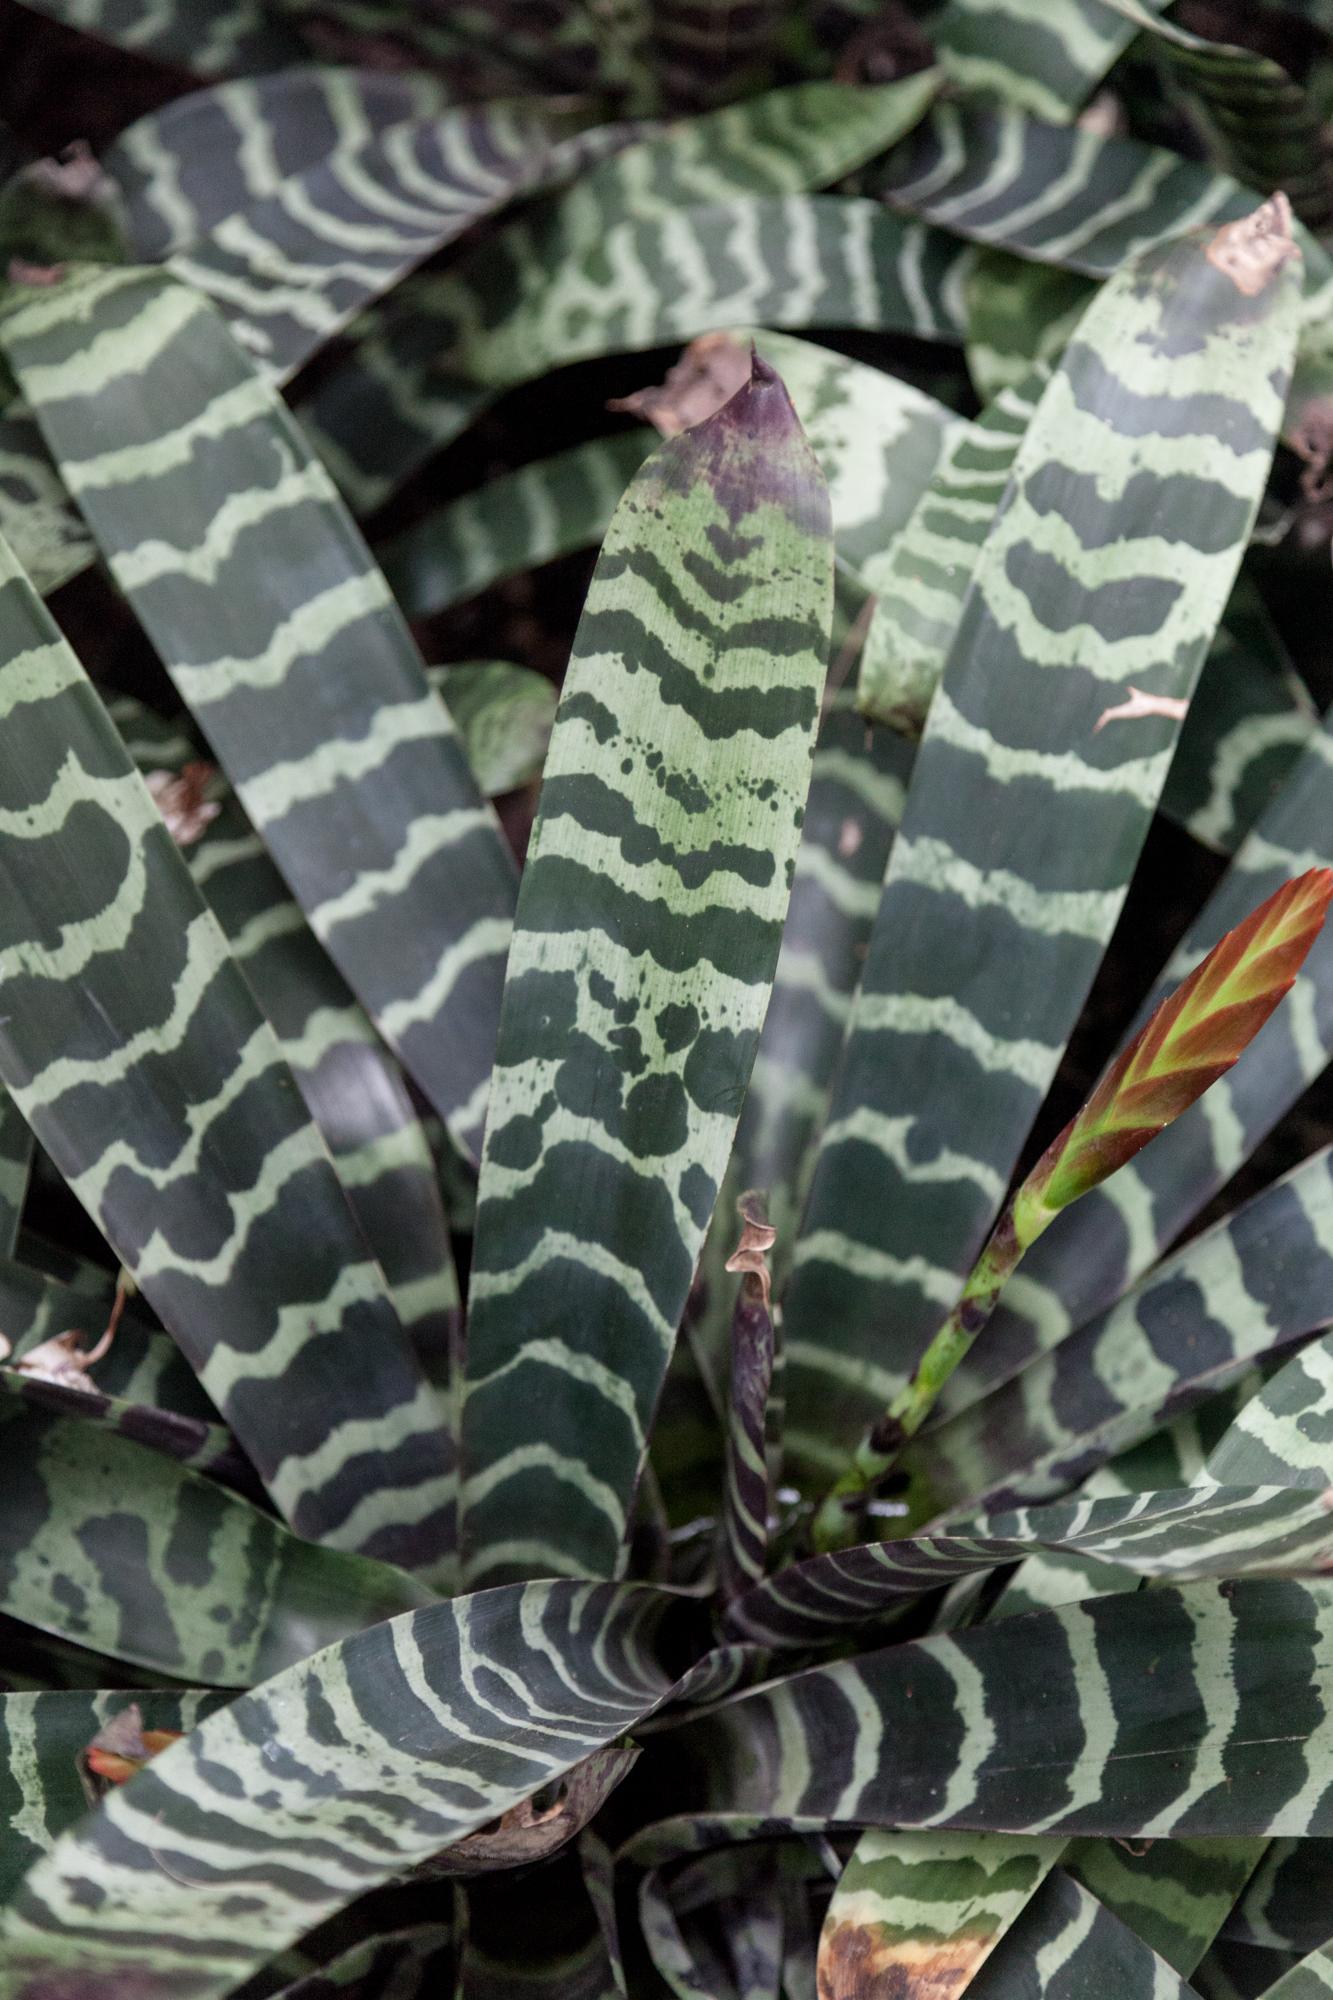 Bromeliad, up-close